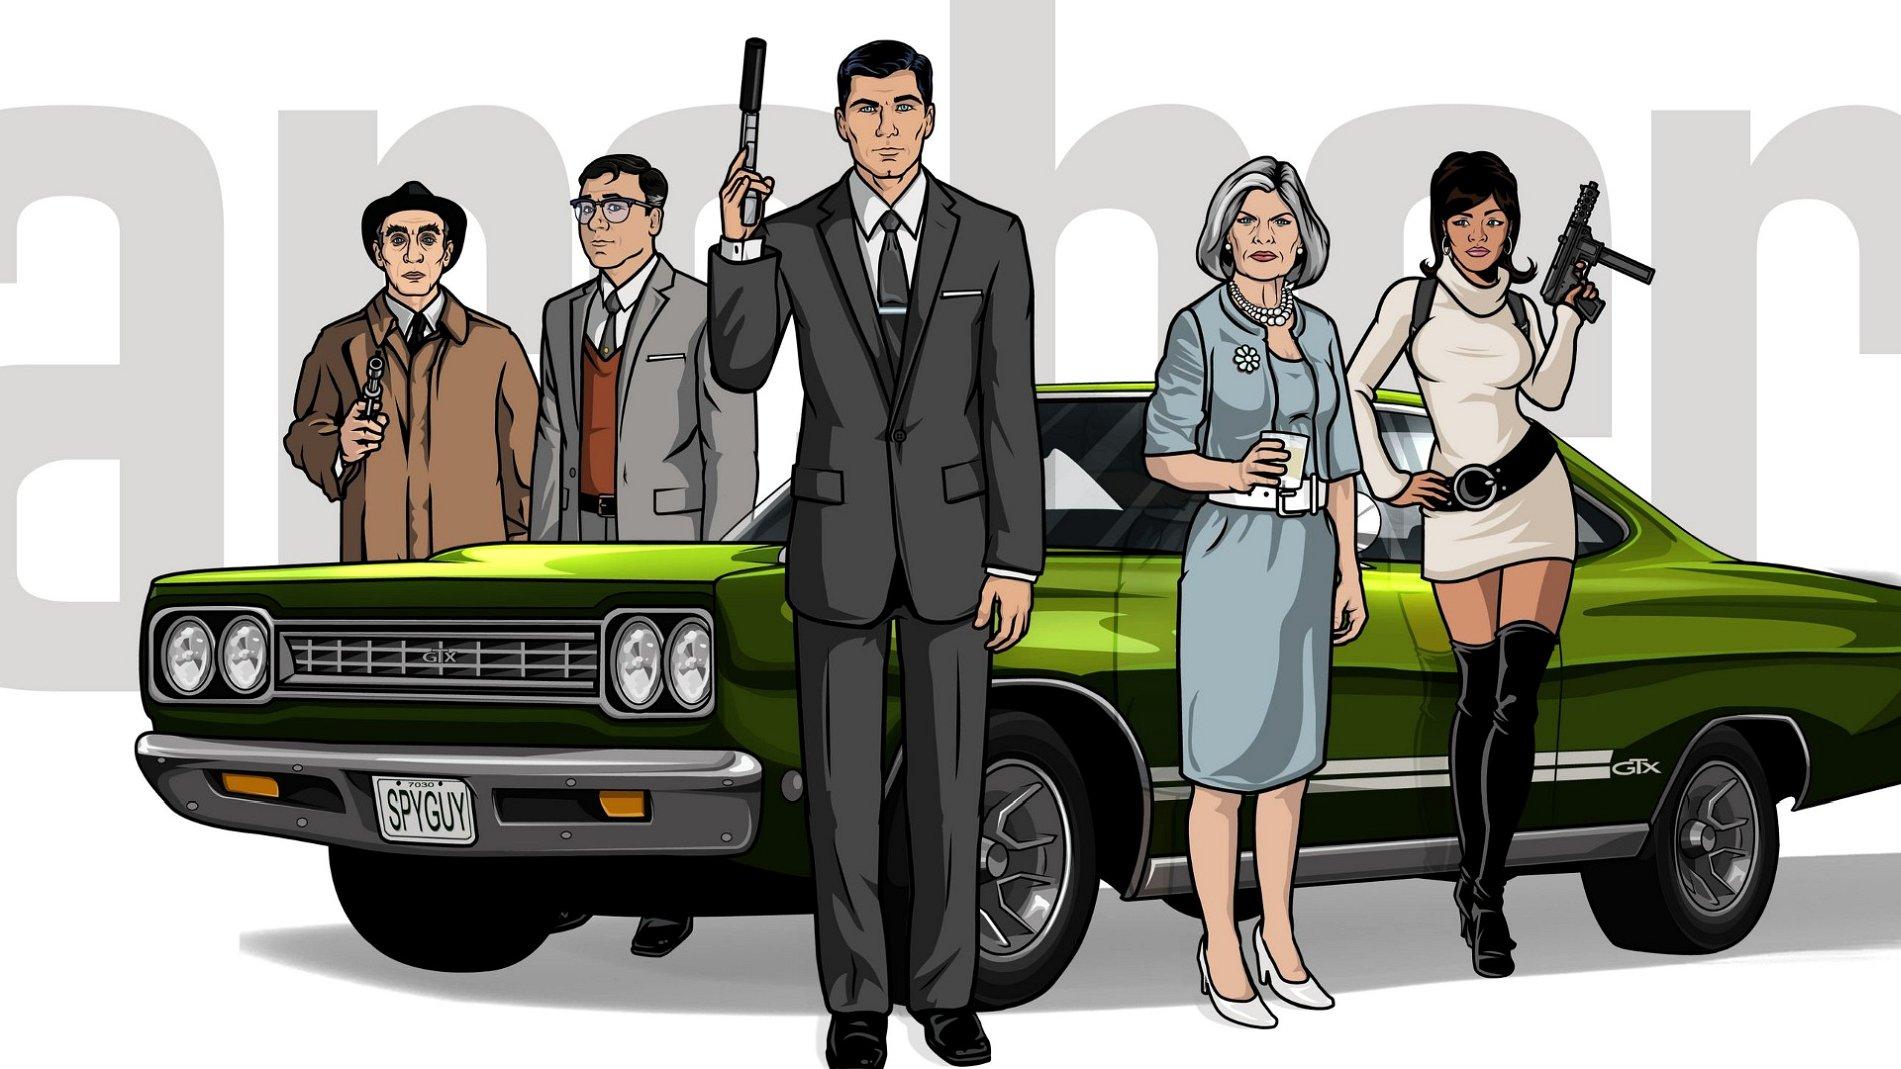 Archer season 6 release date in Melbourne